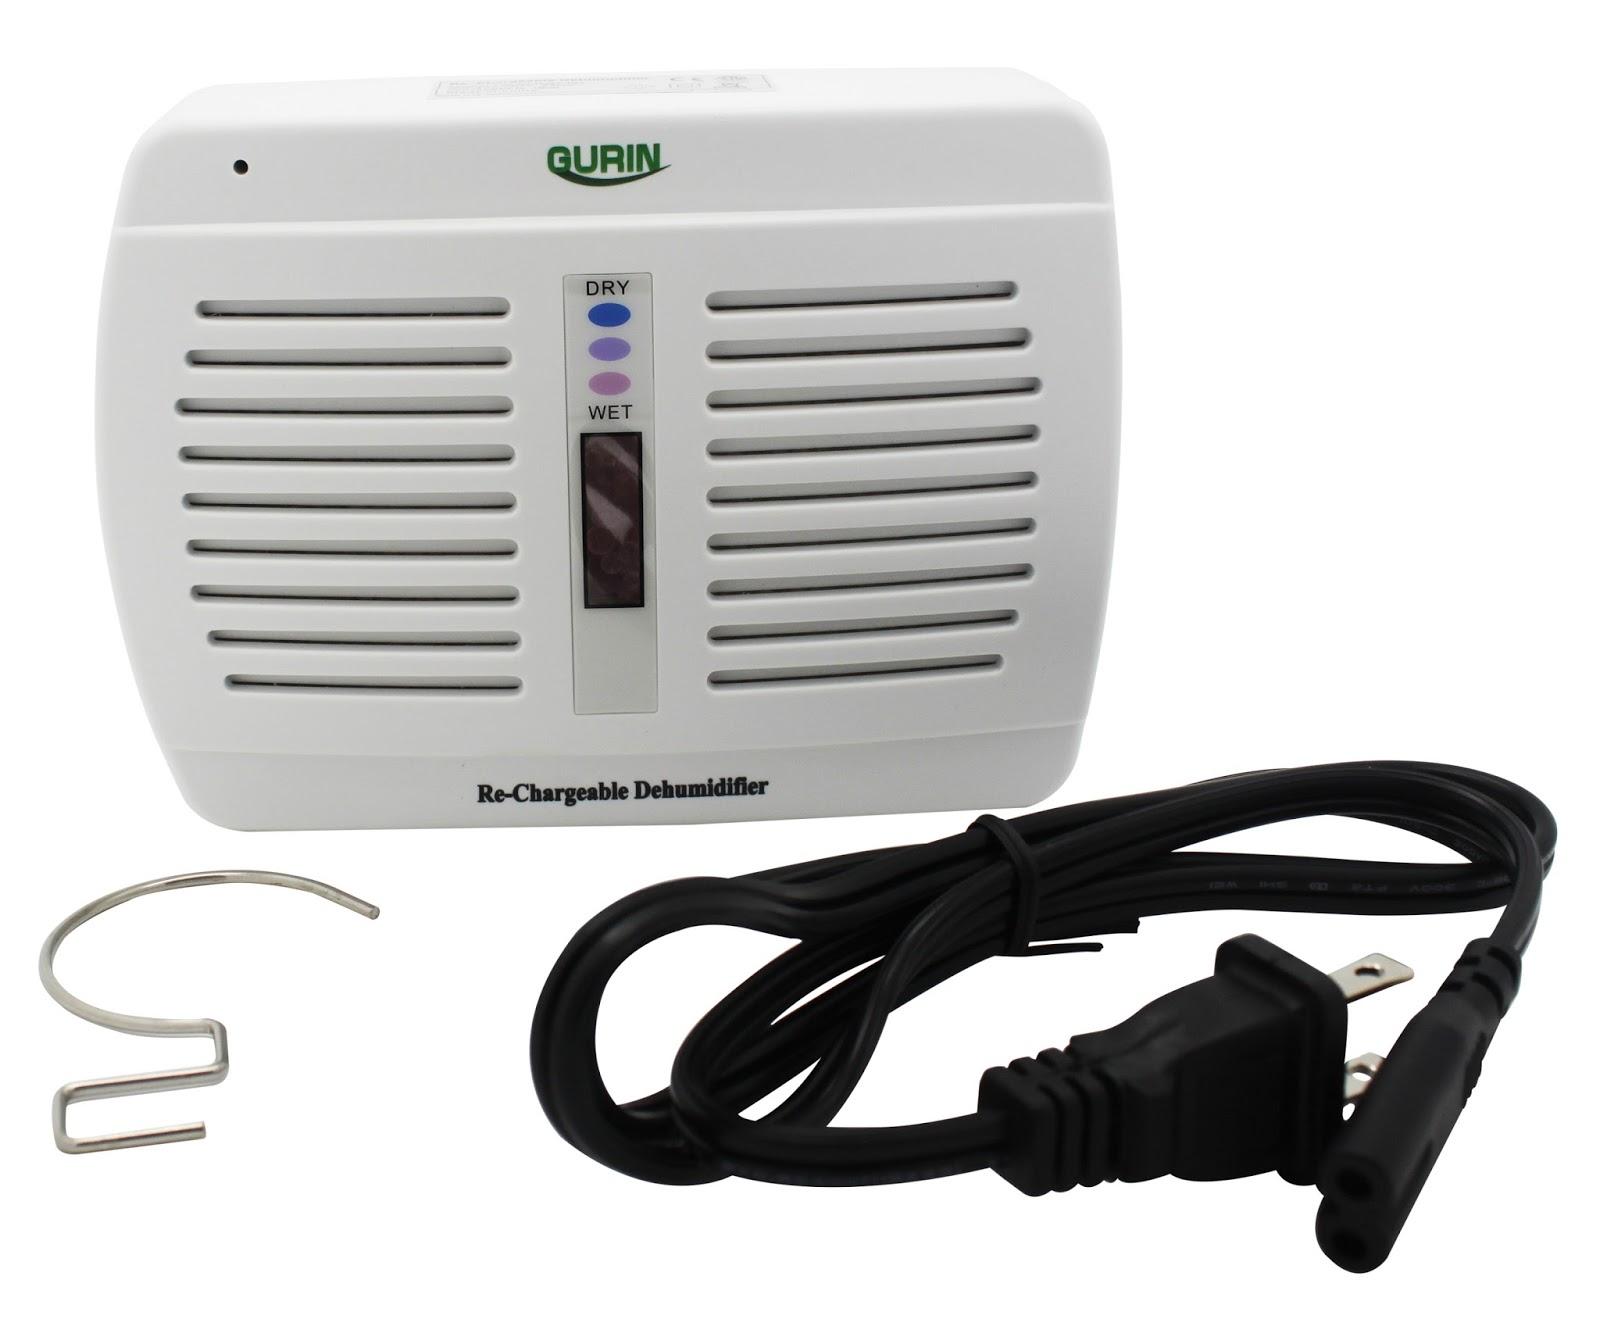 100 Walmart Dehumidifier For Basement Gurin Dhmd 110 Renewable Wireless Dehumidifier Mini